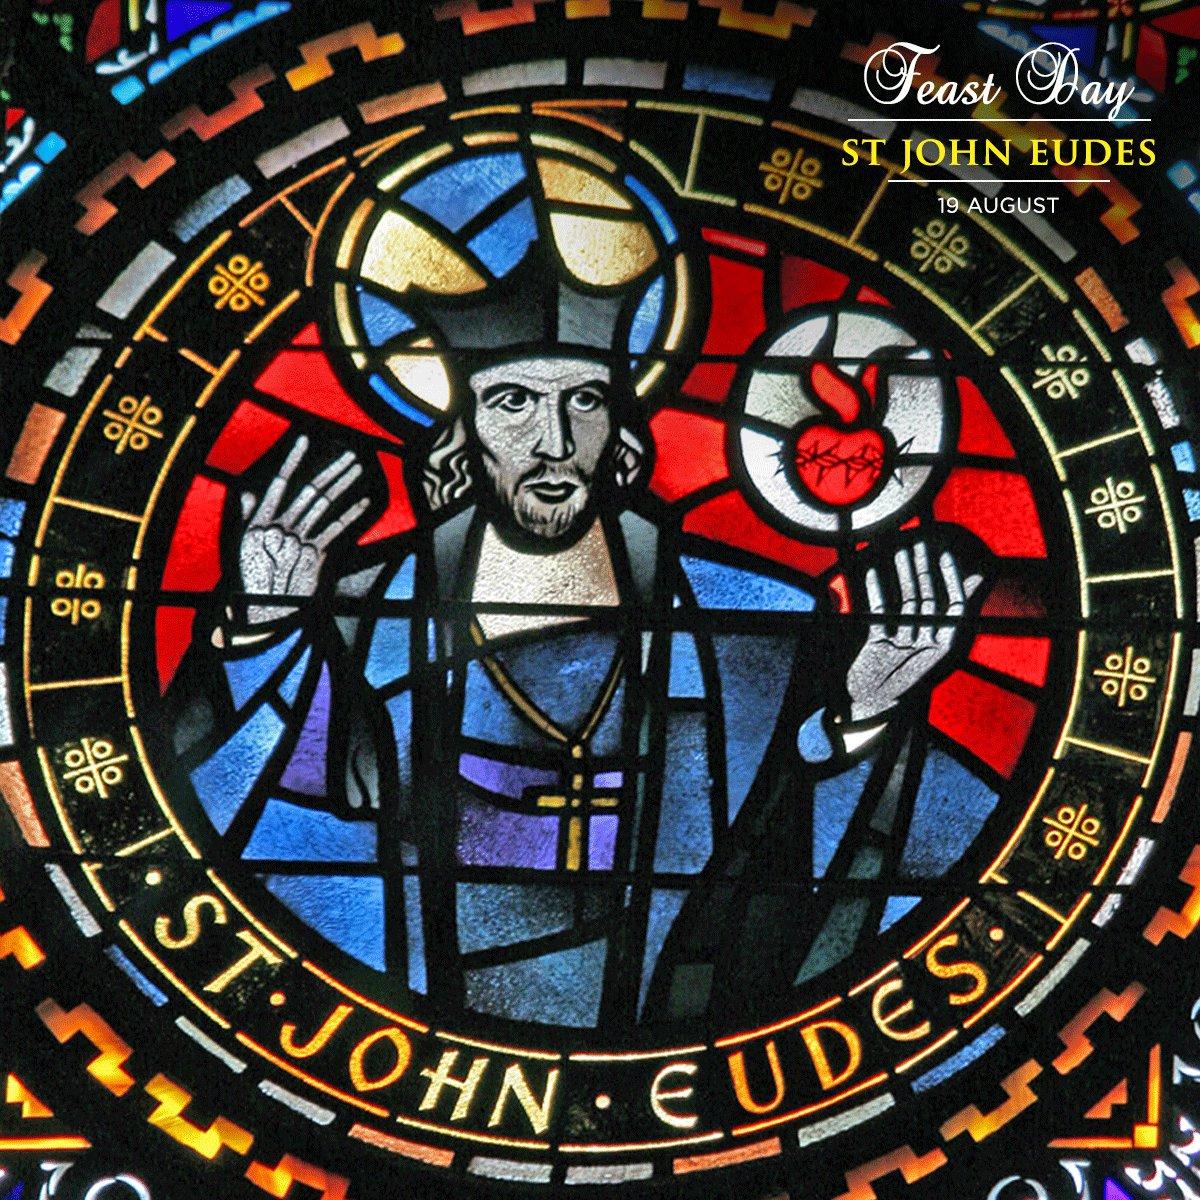 Saint John Eudes left spiritual writings and promoted devotion to the Sacred Heart of Jesus and of Mary. #saint #prayforus #feastday #prayer<br>http://pic.twitter.com/ha2Dp7sgju